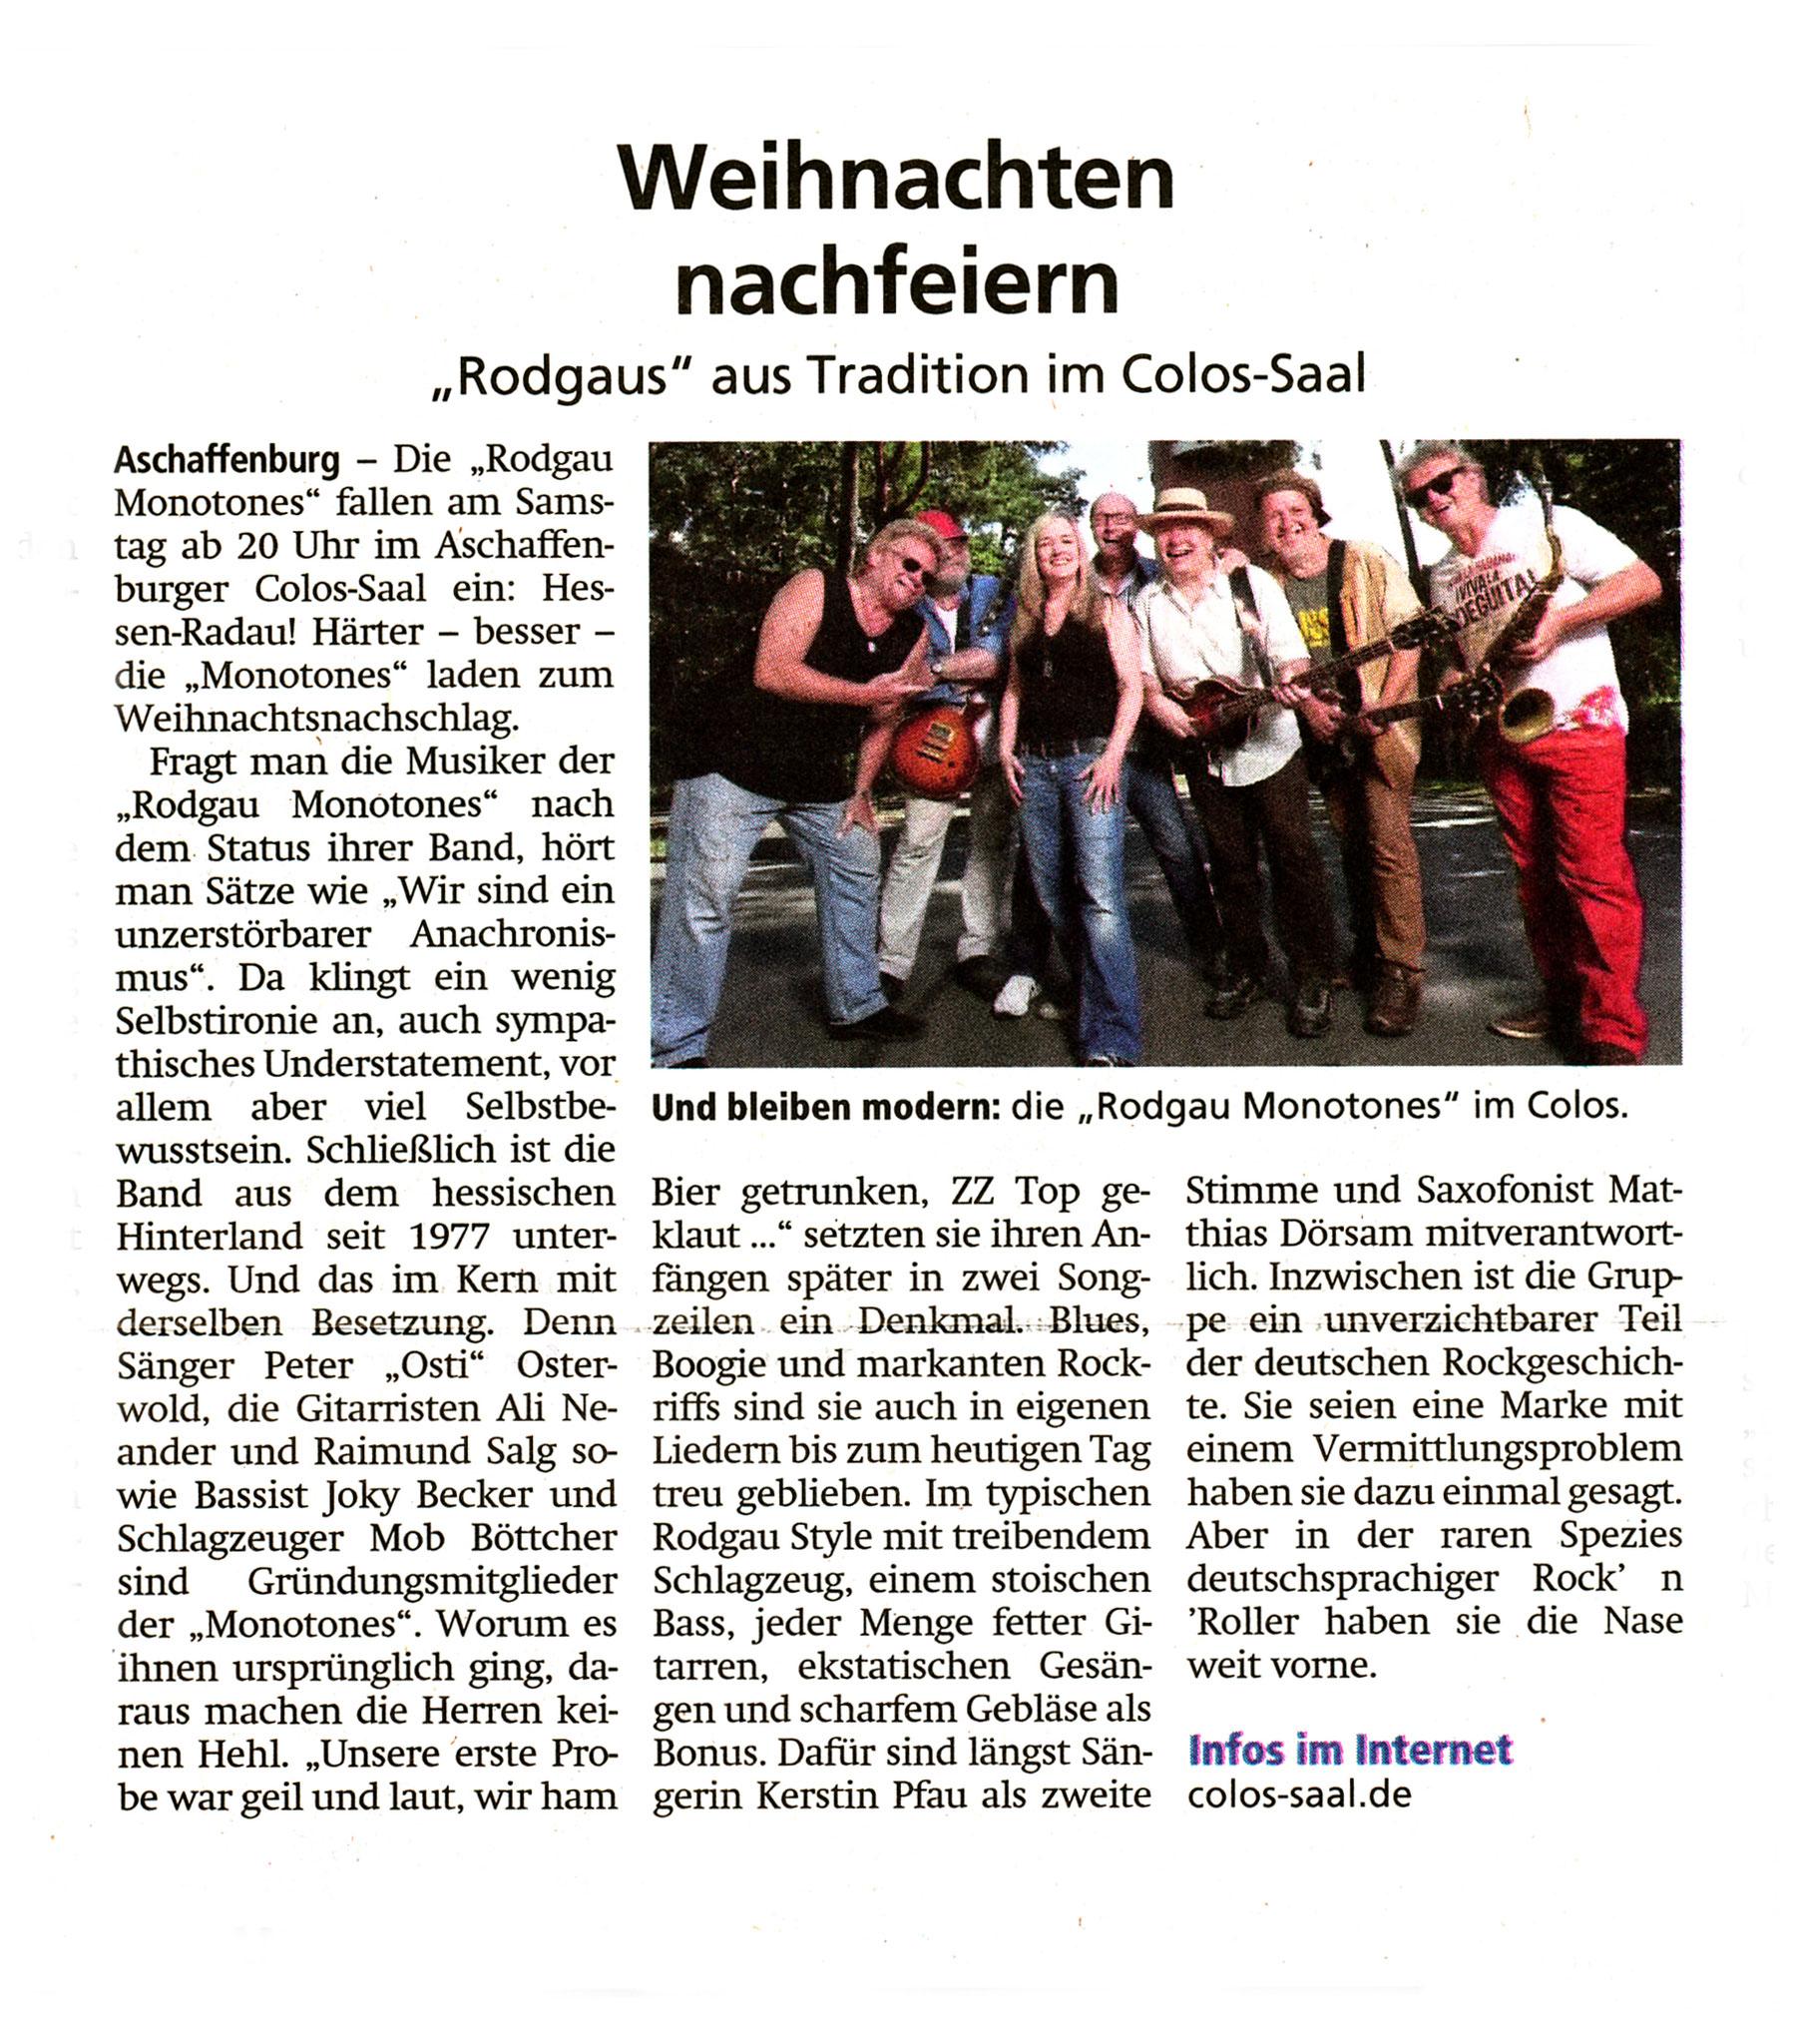 Offenbach Post, 2. März 2019